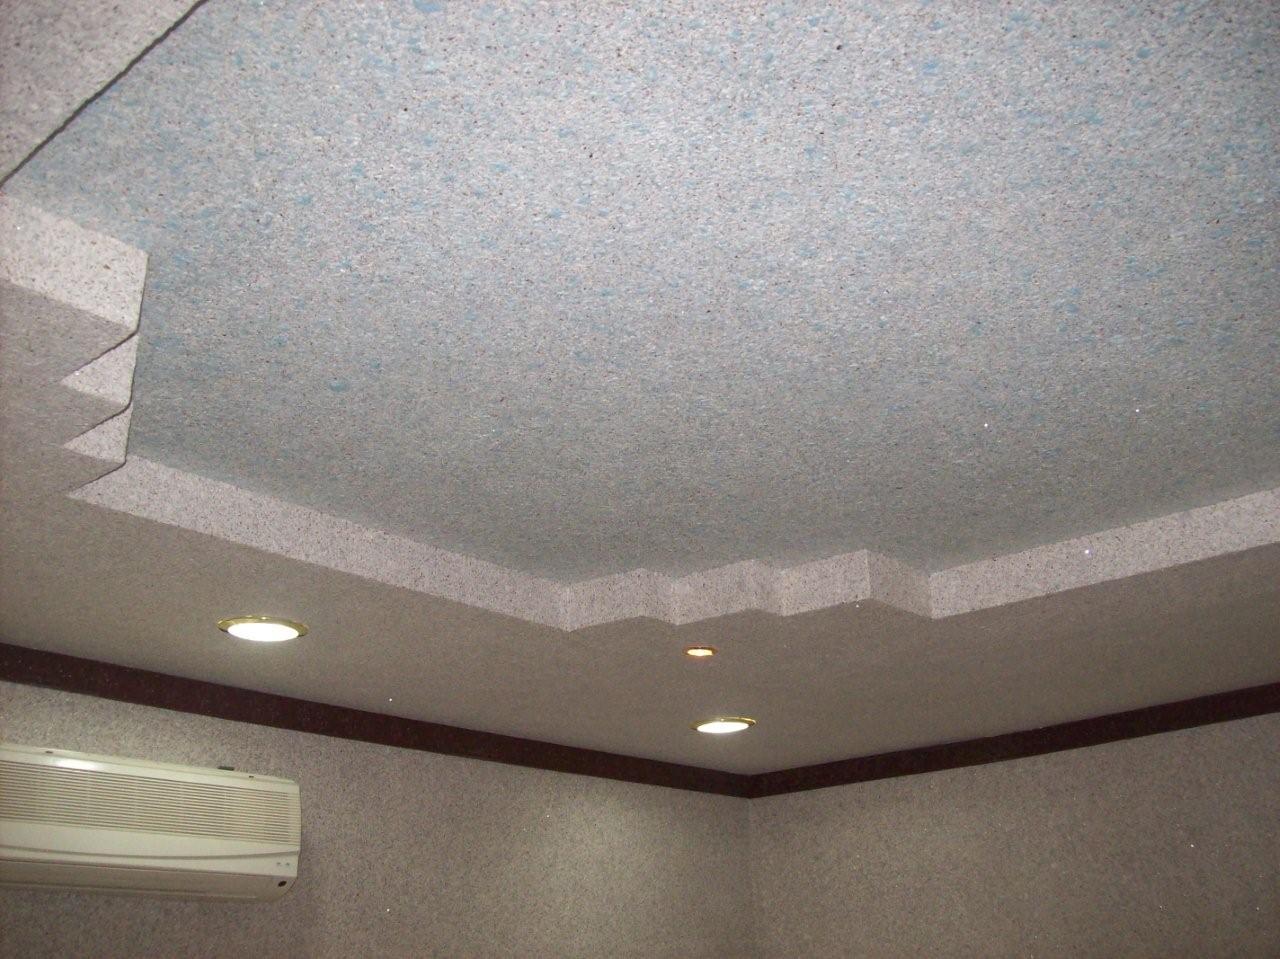 Жидкий потолок фото